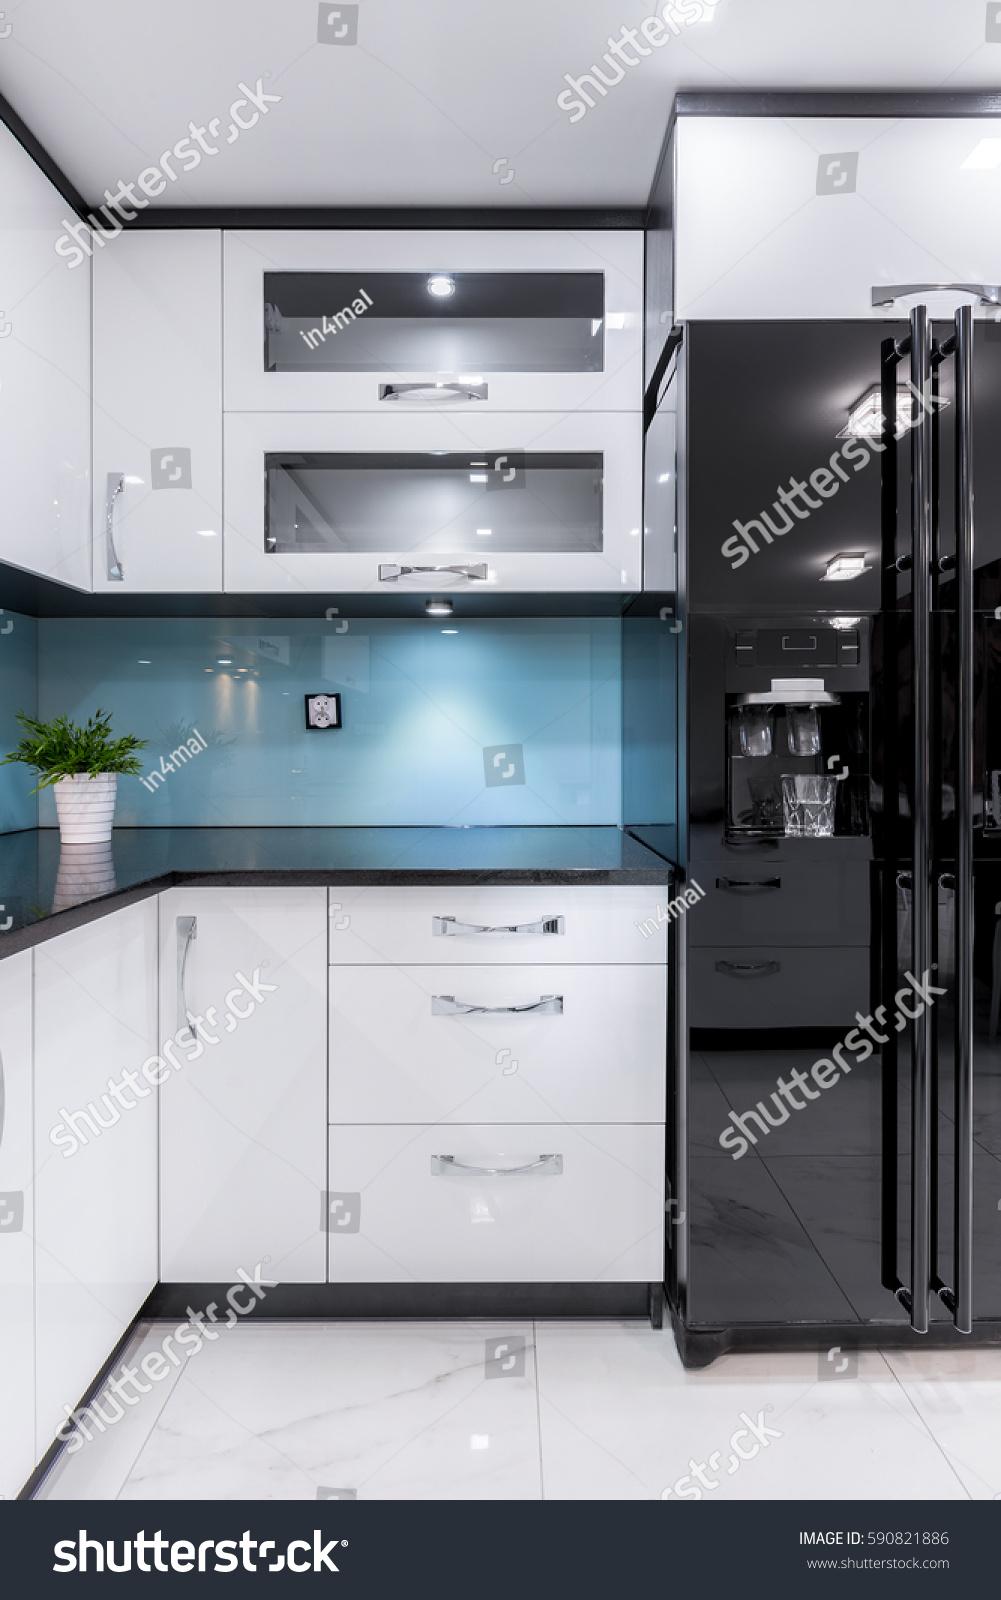 Beautifully Designed Kitchen Interior Minimalist Color Stock Photo ...